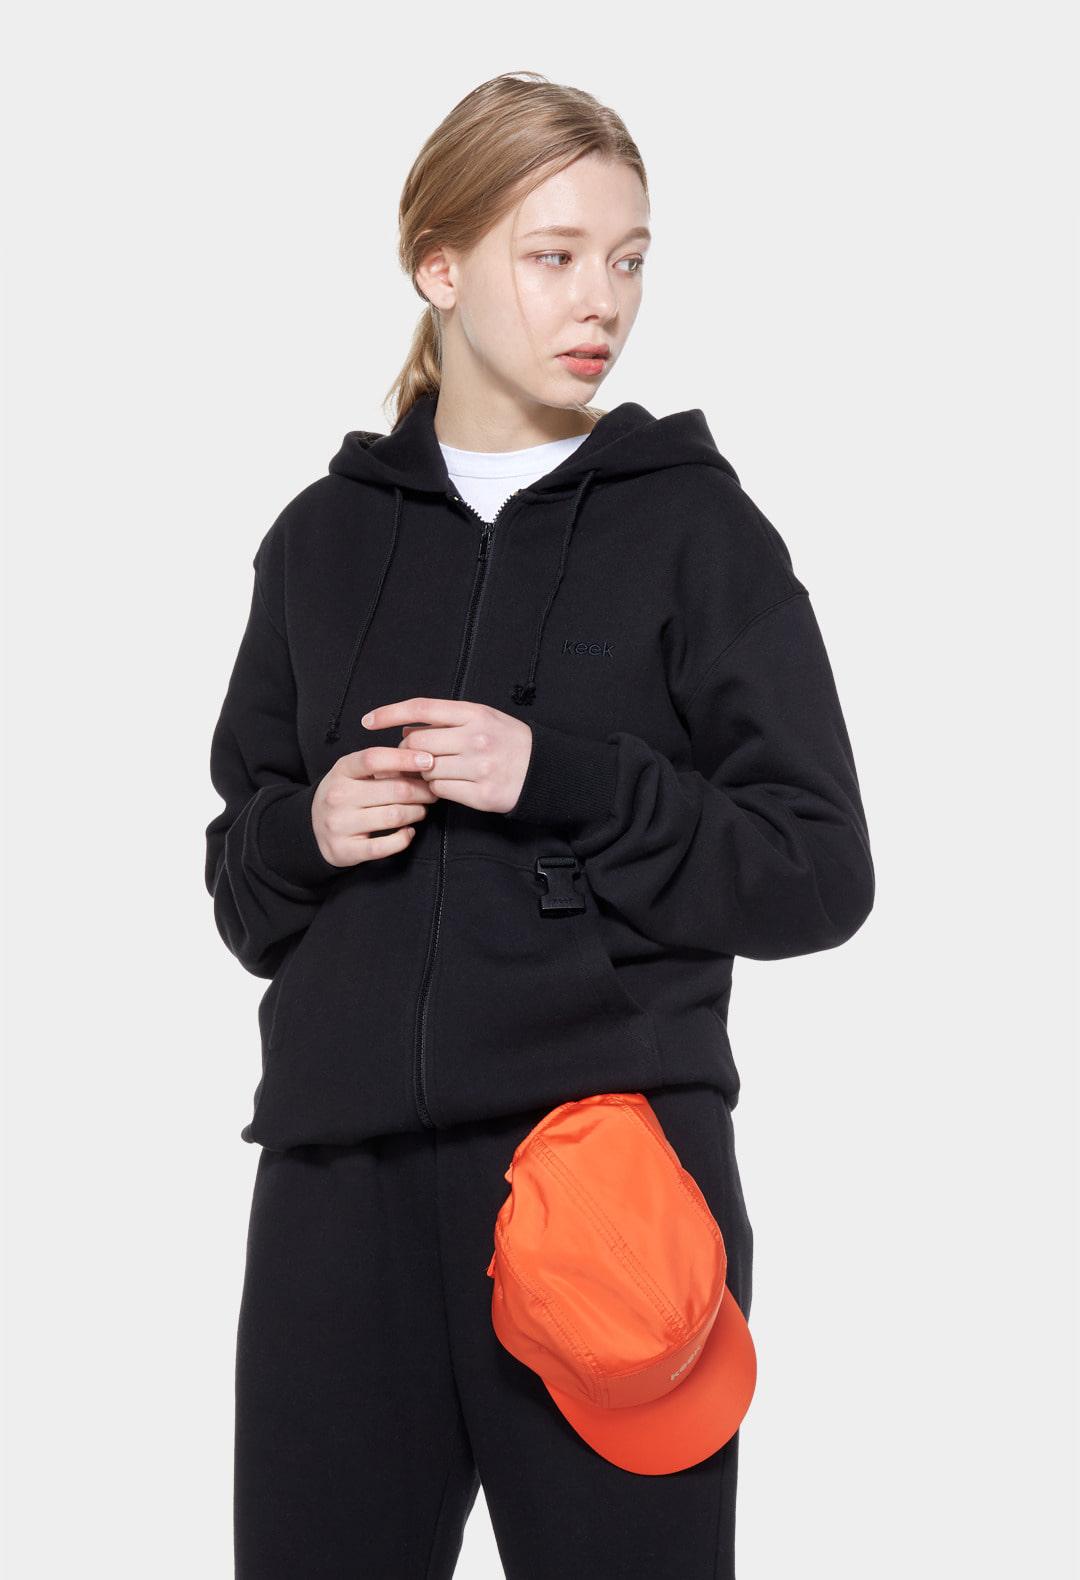 keek Buckle Zip-up - Black 스트릿패션 유니섹스브랜드 커플시밀러룩 남자쇼핑몰 여성의류쇼핑몰 후드티 힙색